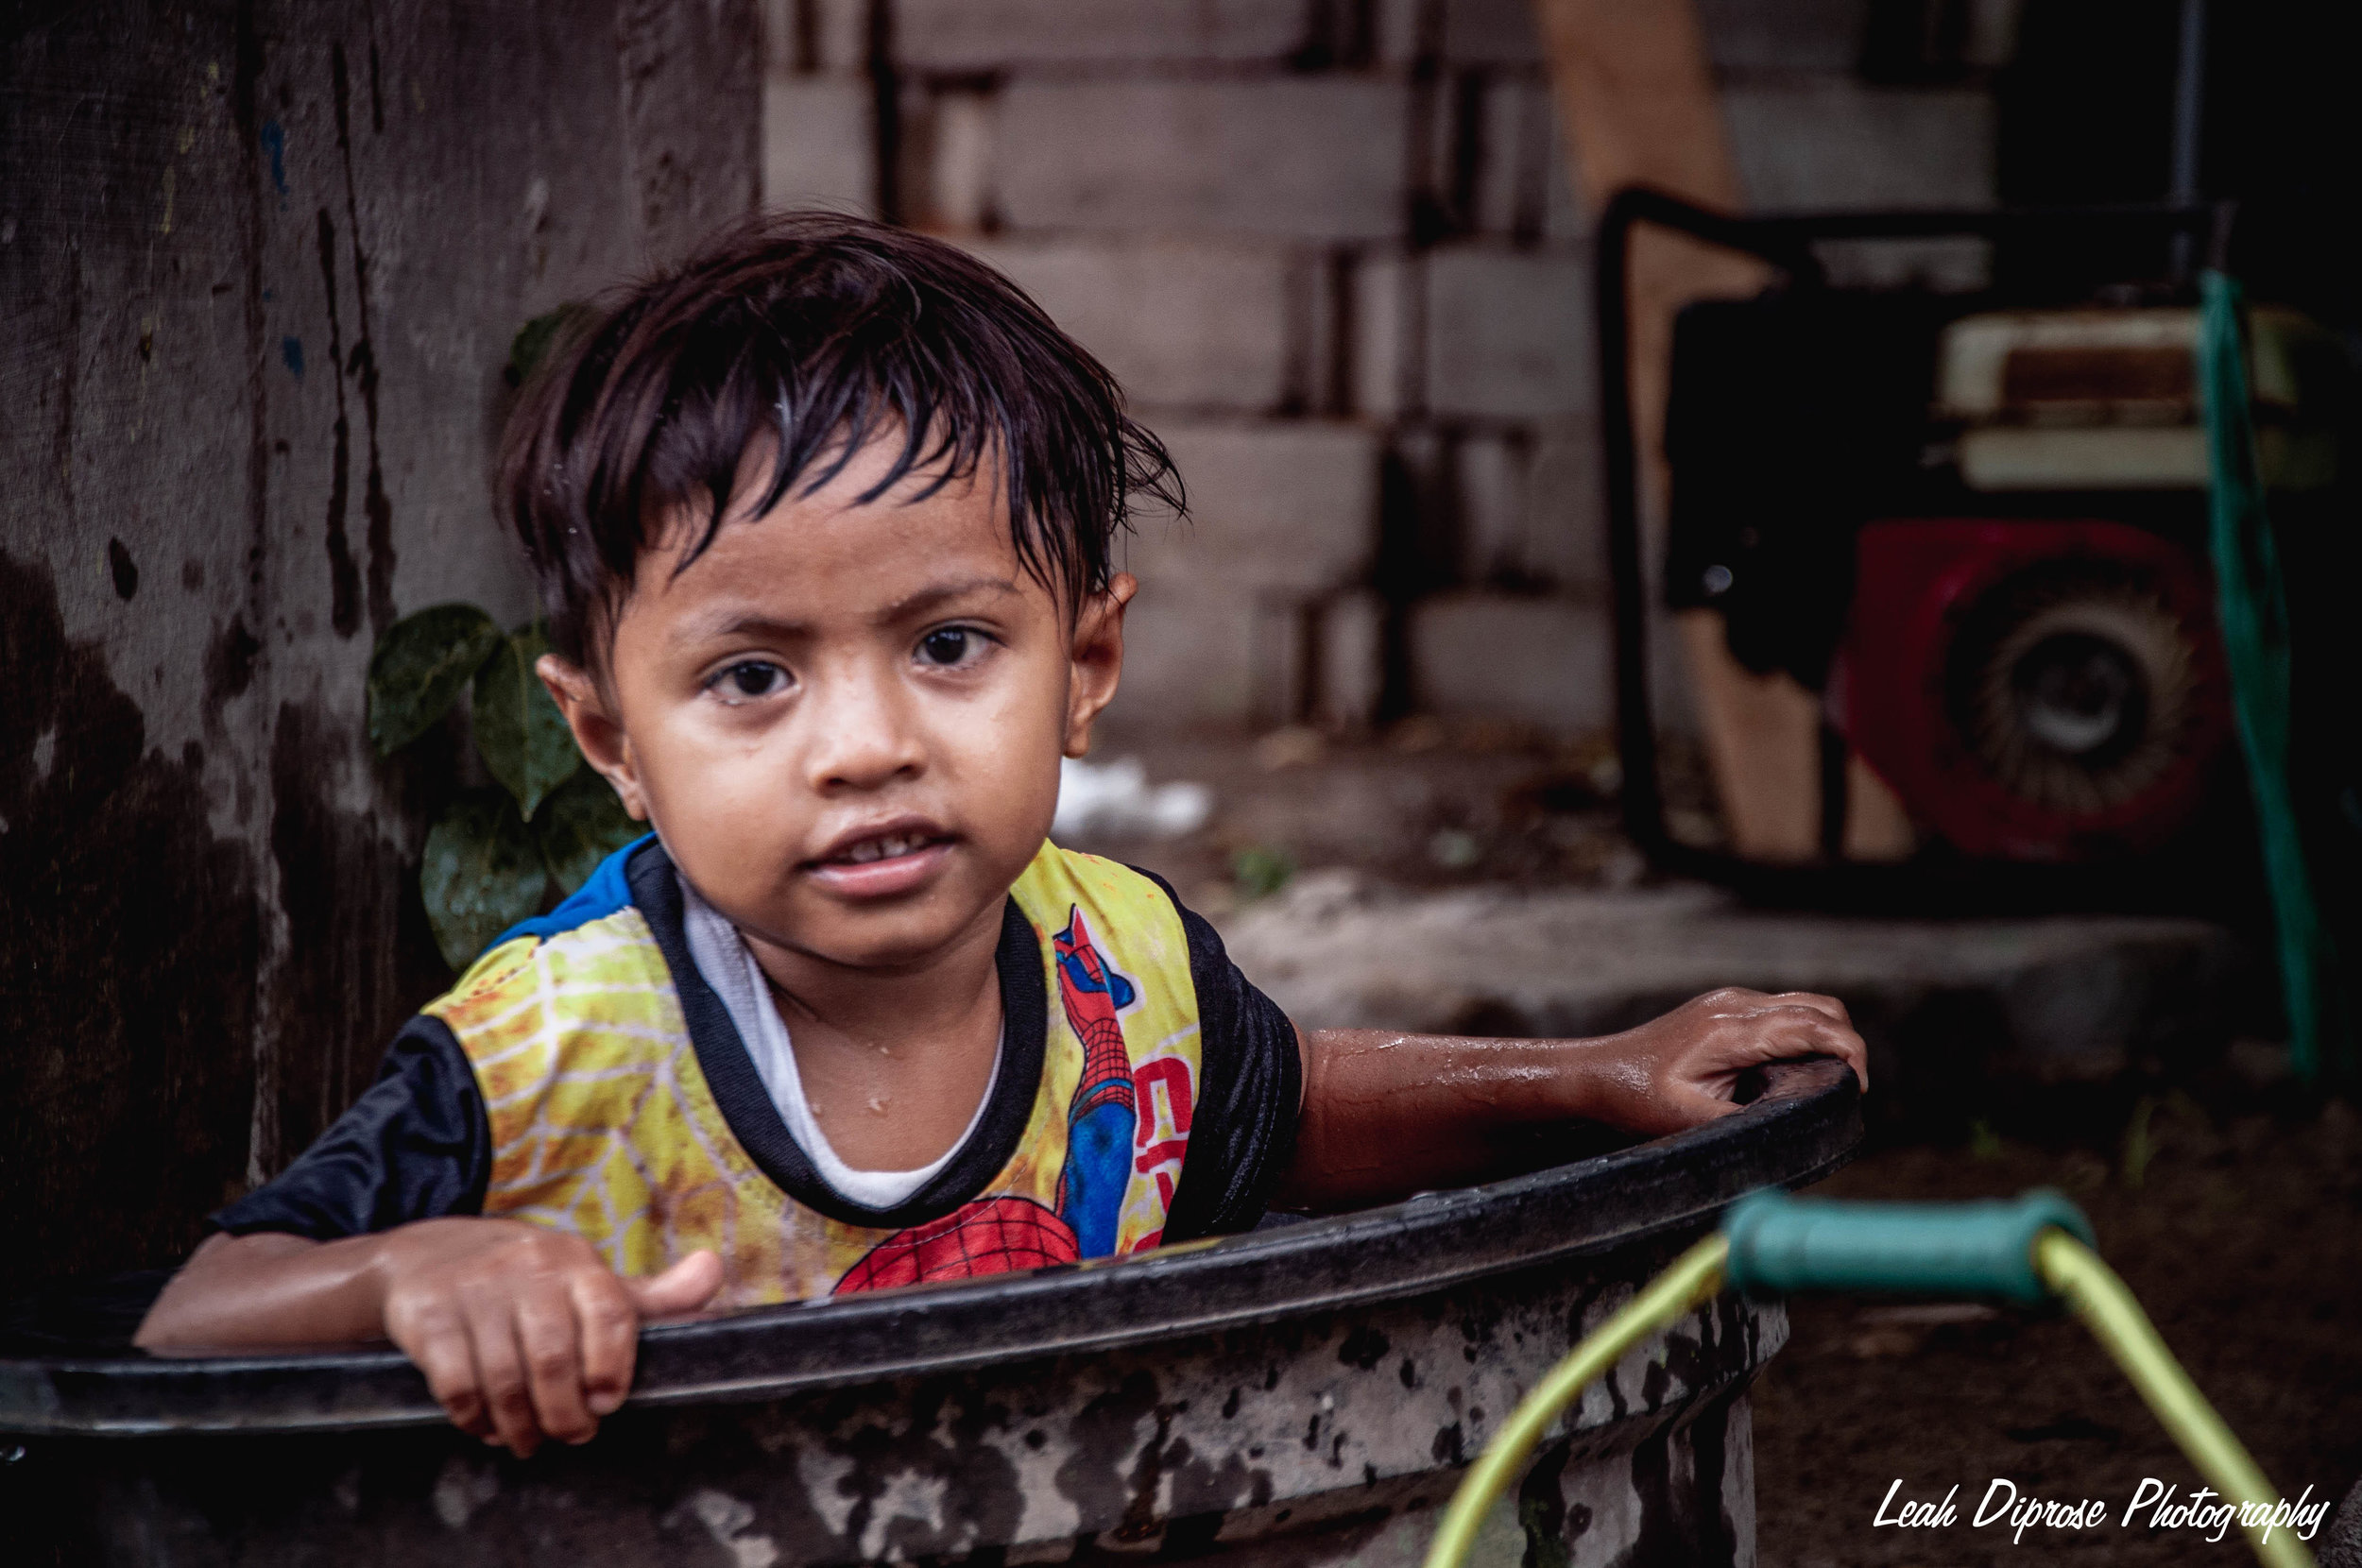 Leah Diprose Photography image-5104.jpg